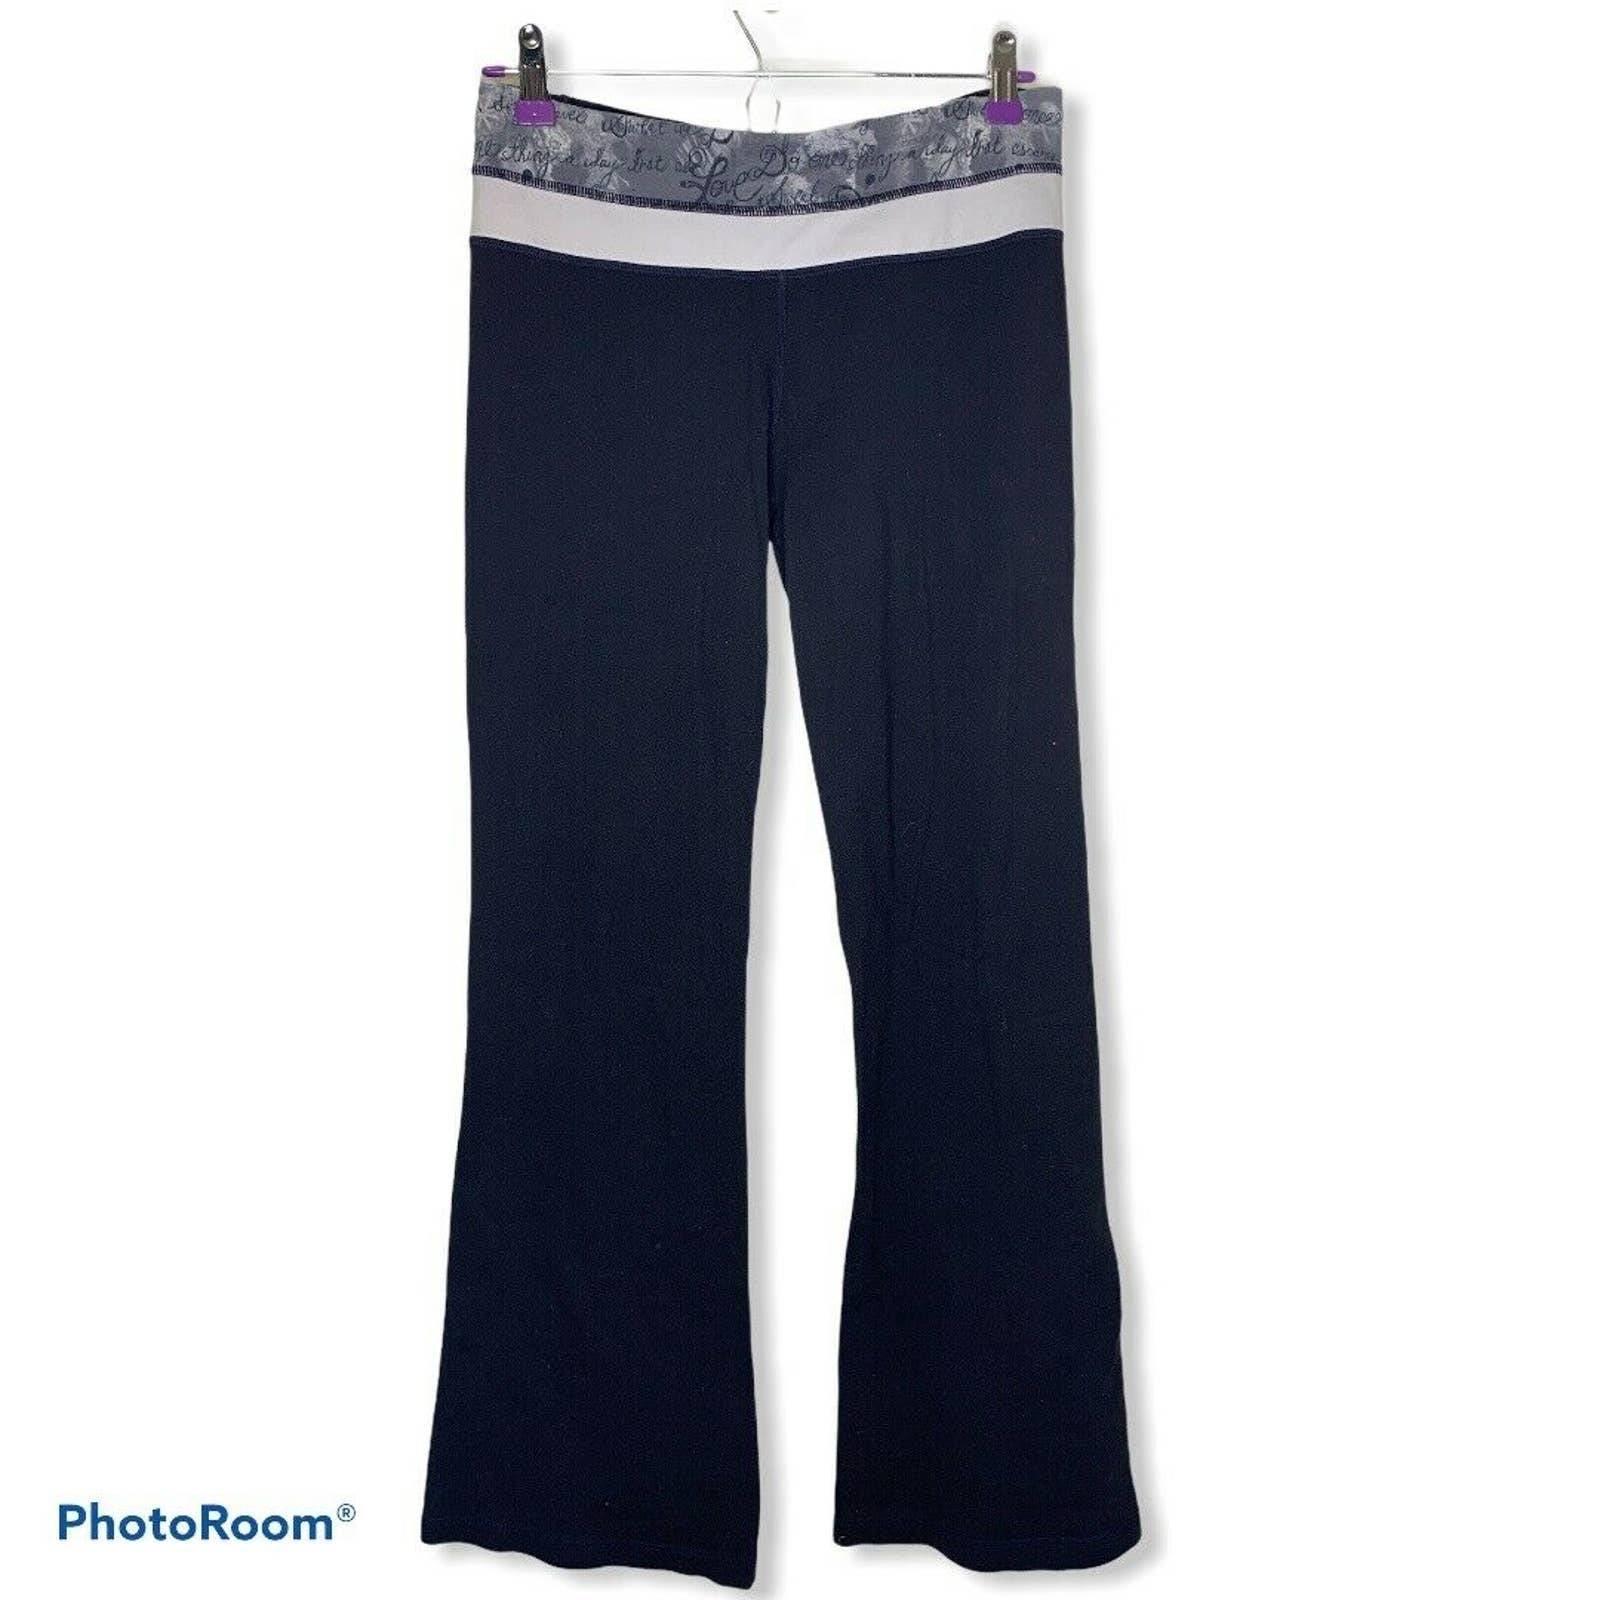 Lululemon black flare pant leggings 6